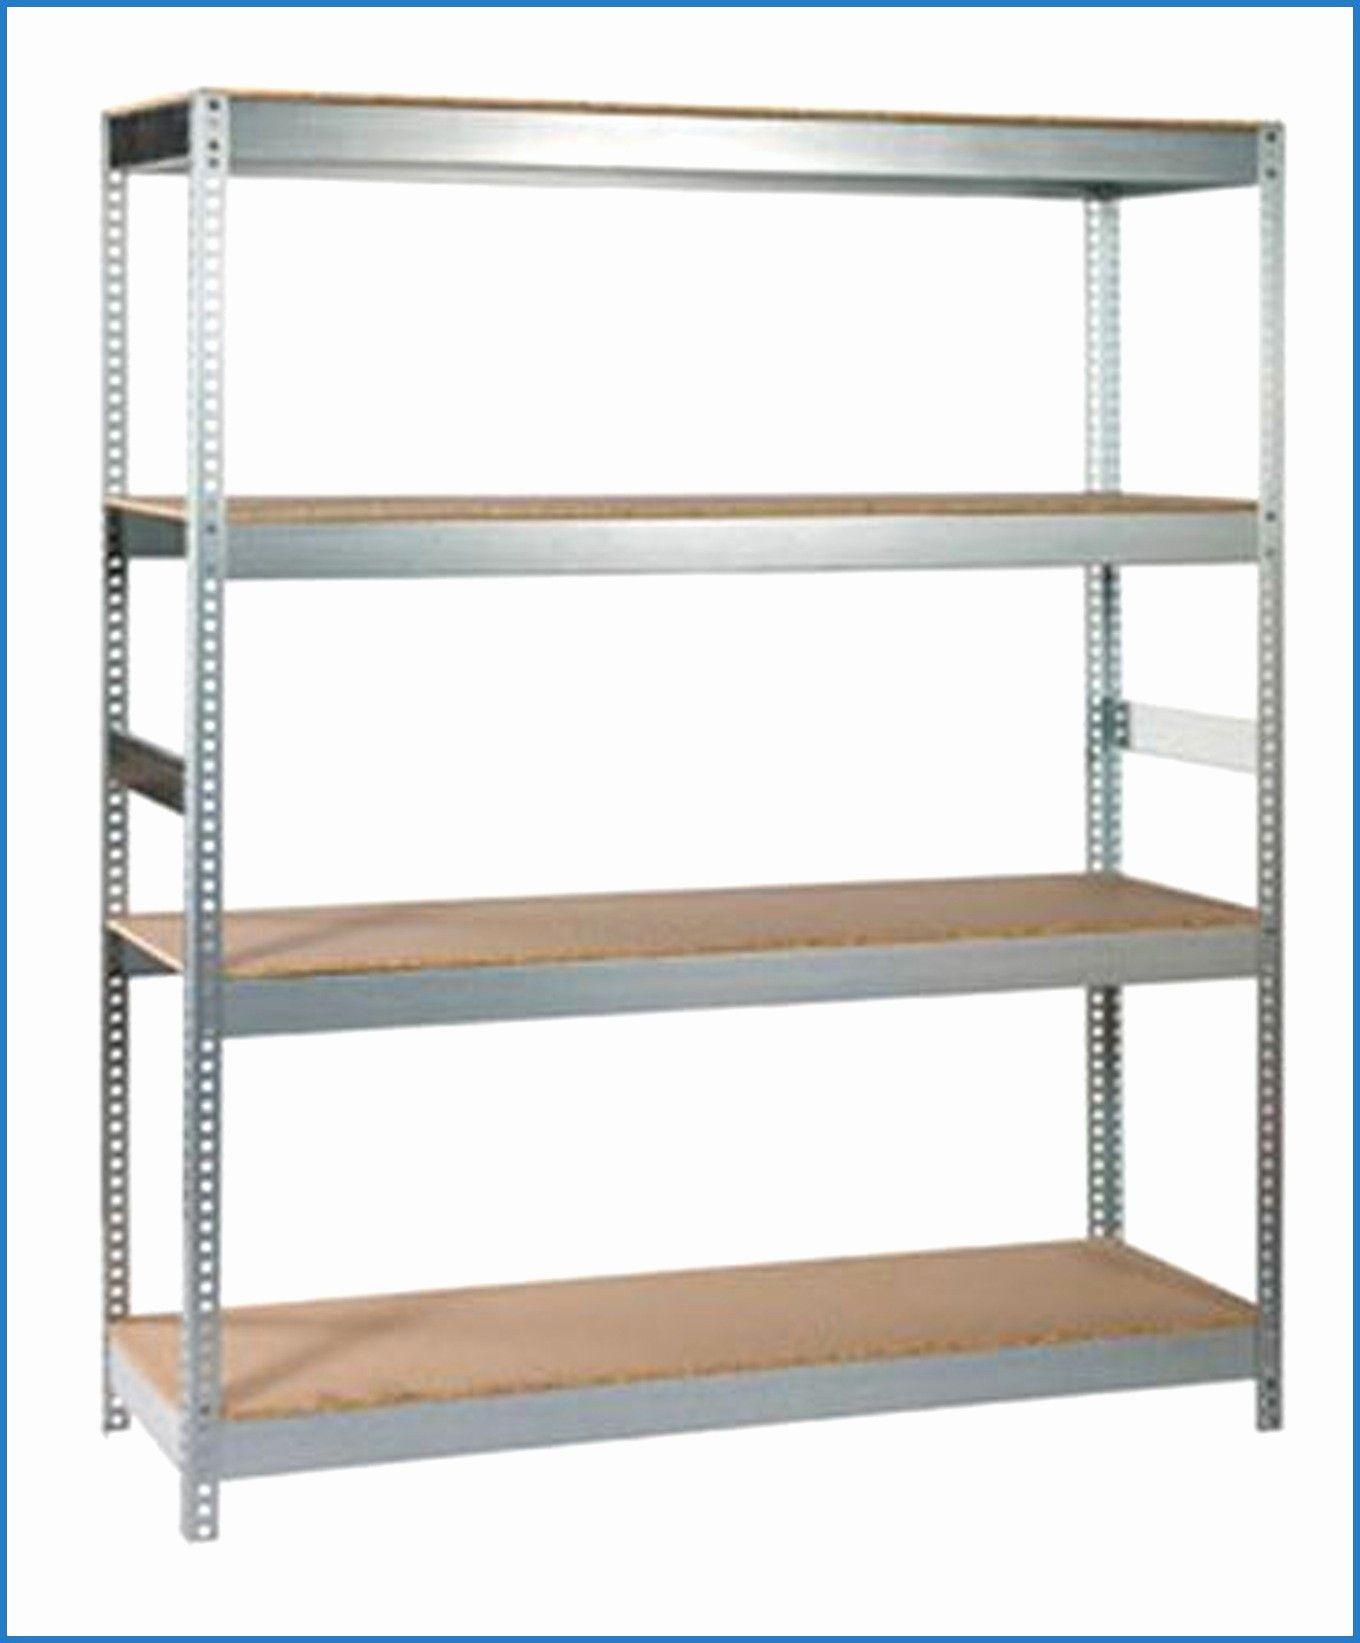 Best Of Rayonnage Castorama Diy Furniture Bedroom Steel House Wood Bookshelves